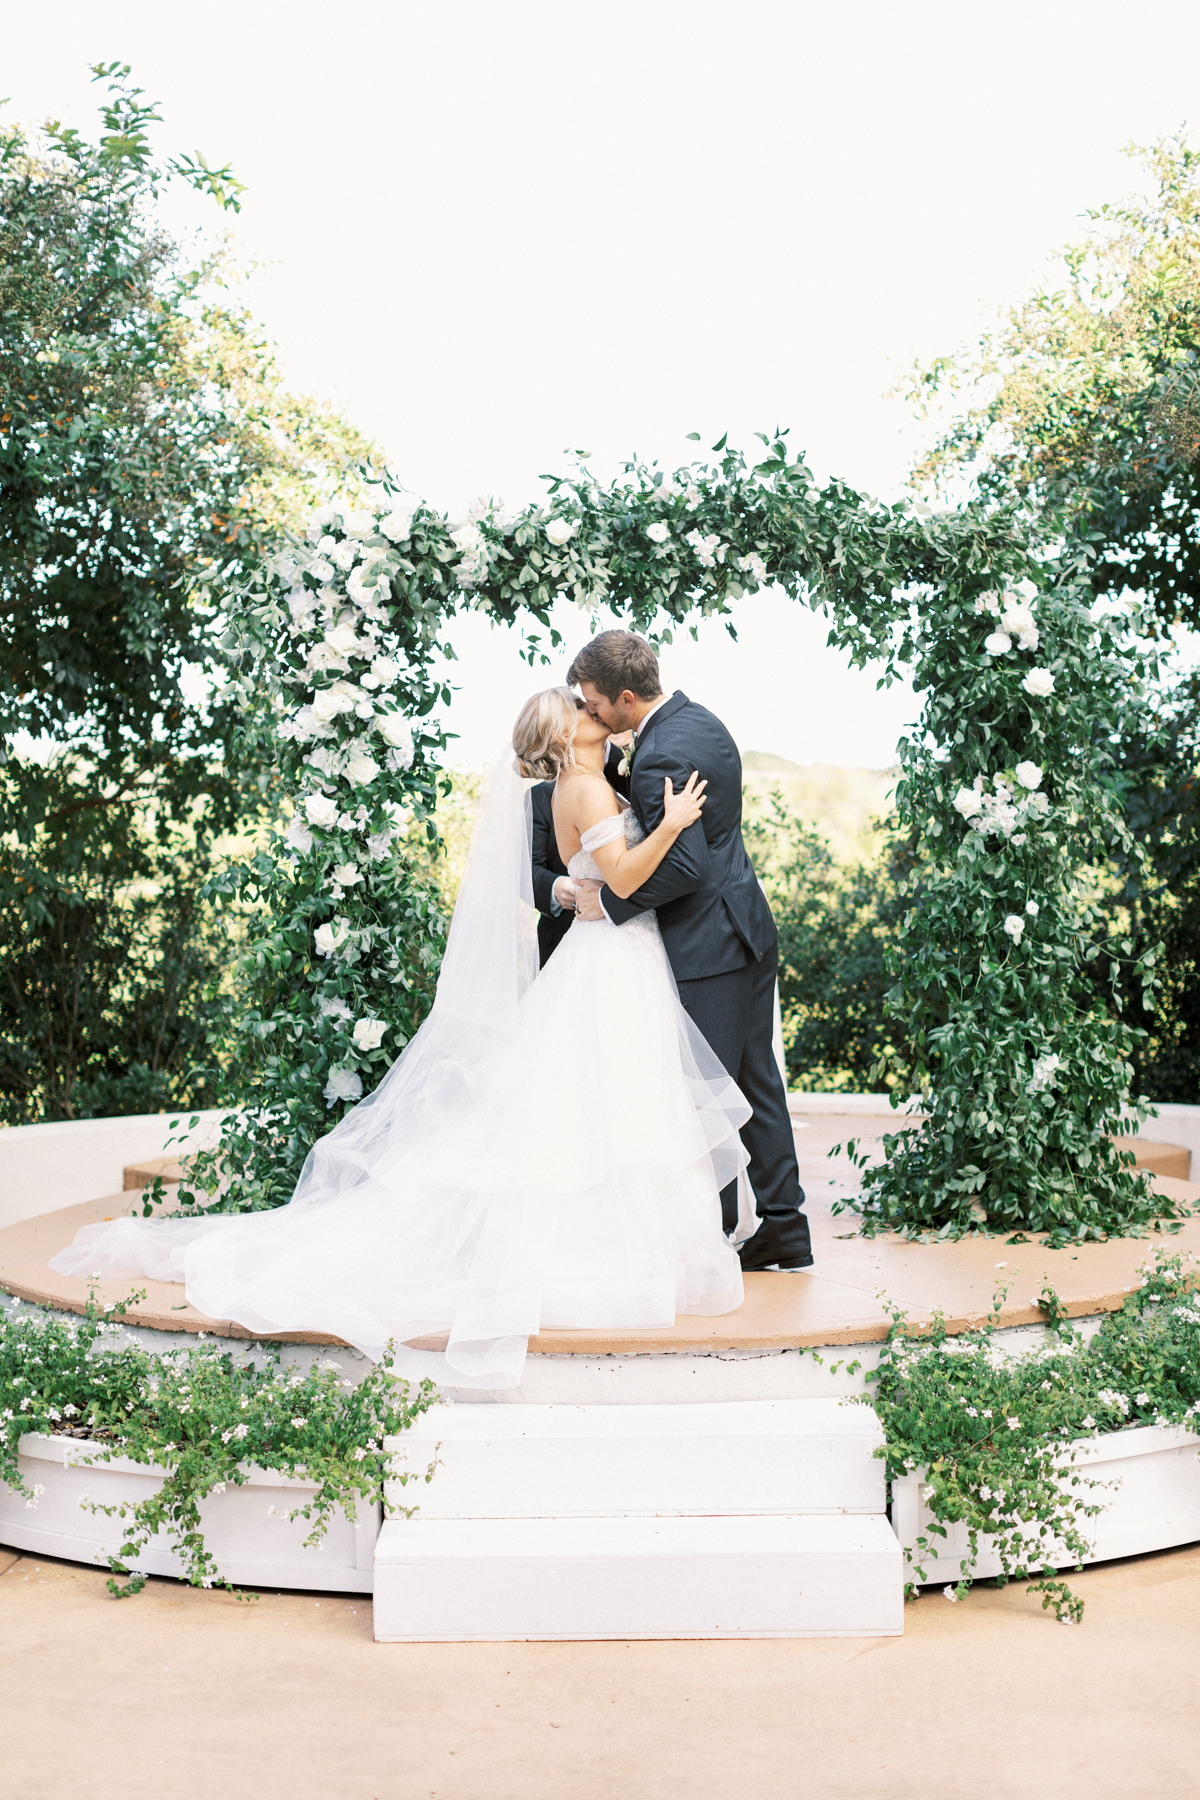 winmock-kinderton-wedding-043.jpg